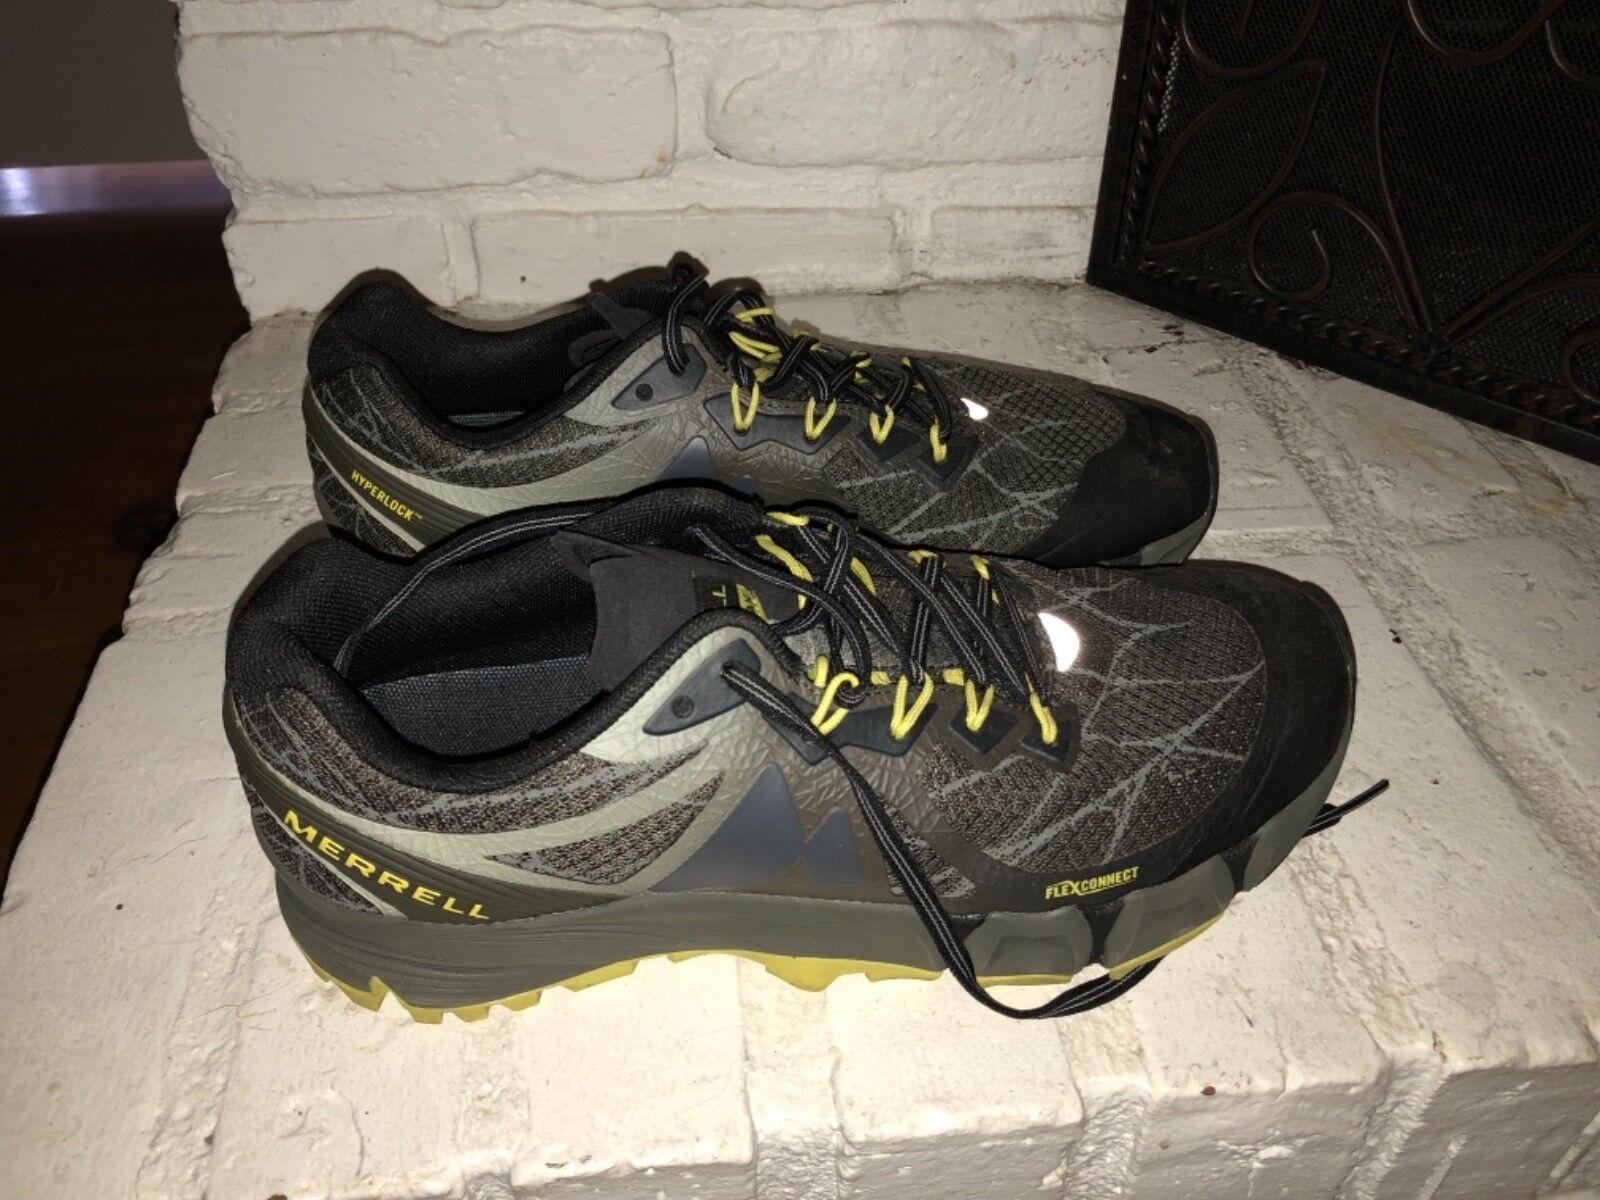 Nuove nike stefan janoski scarpa hyperfeel 844443-001 uomini pattinatori scarpa janoski nera 9beca5